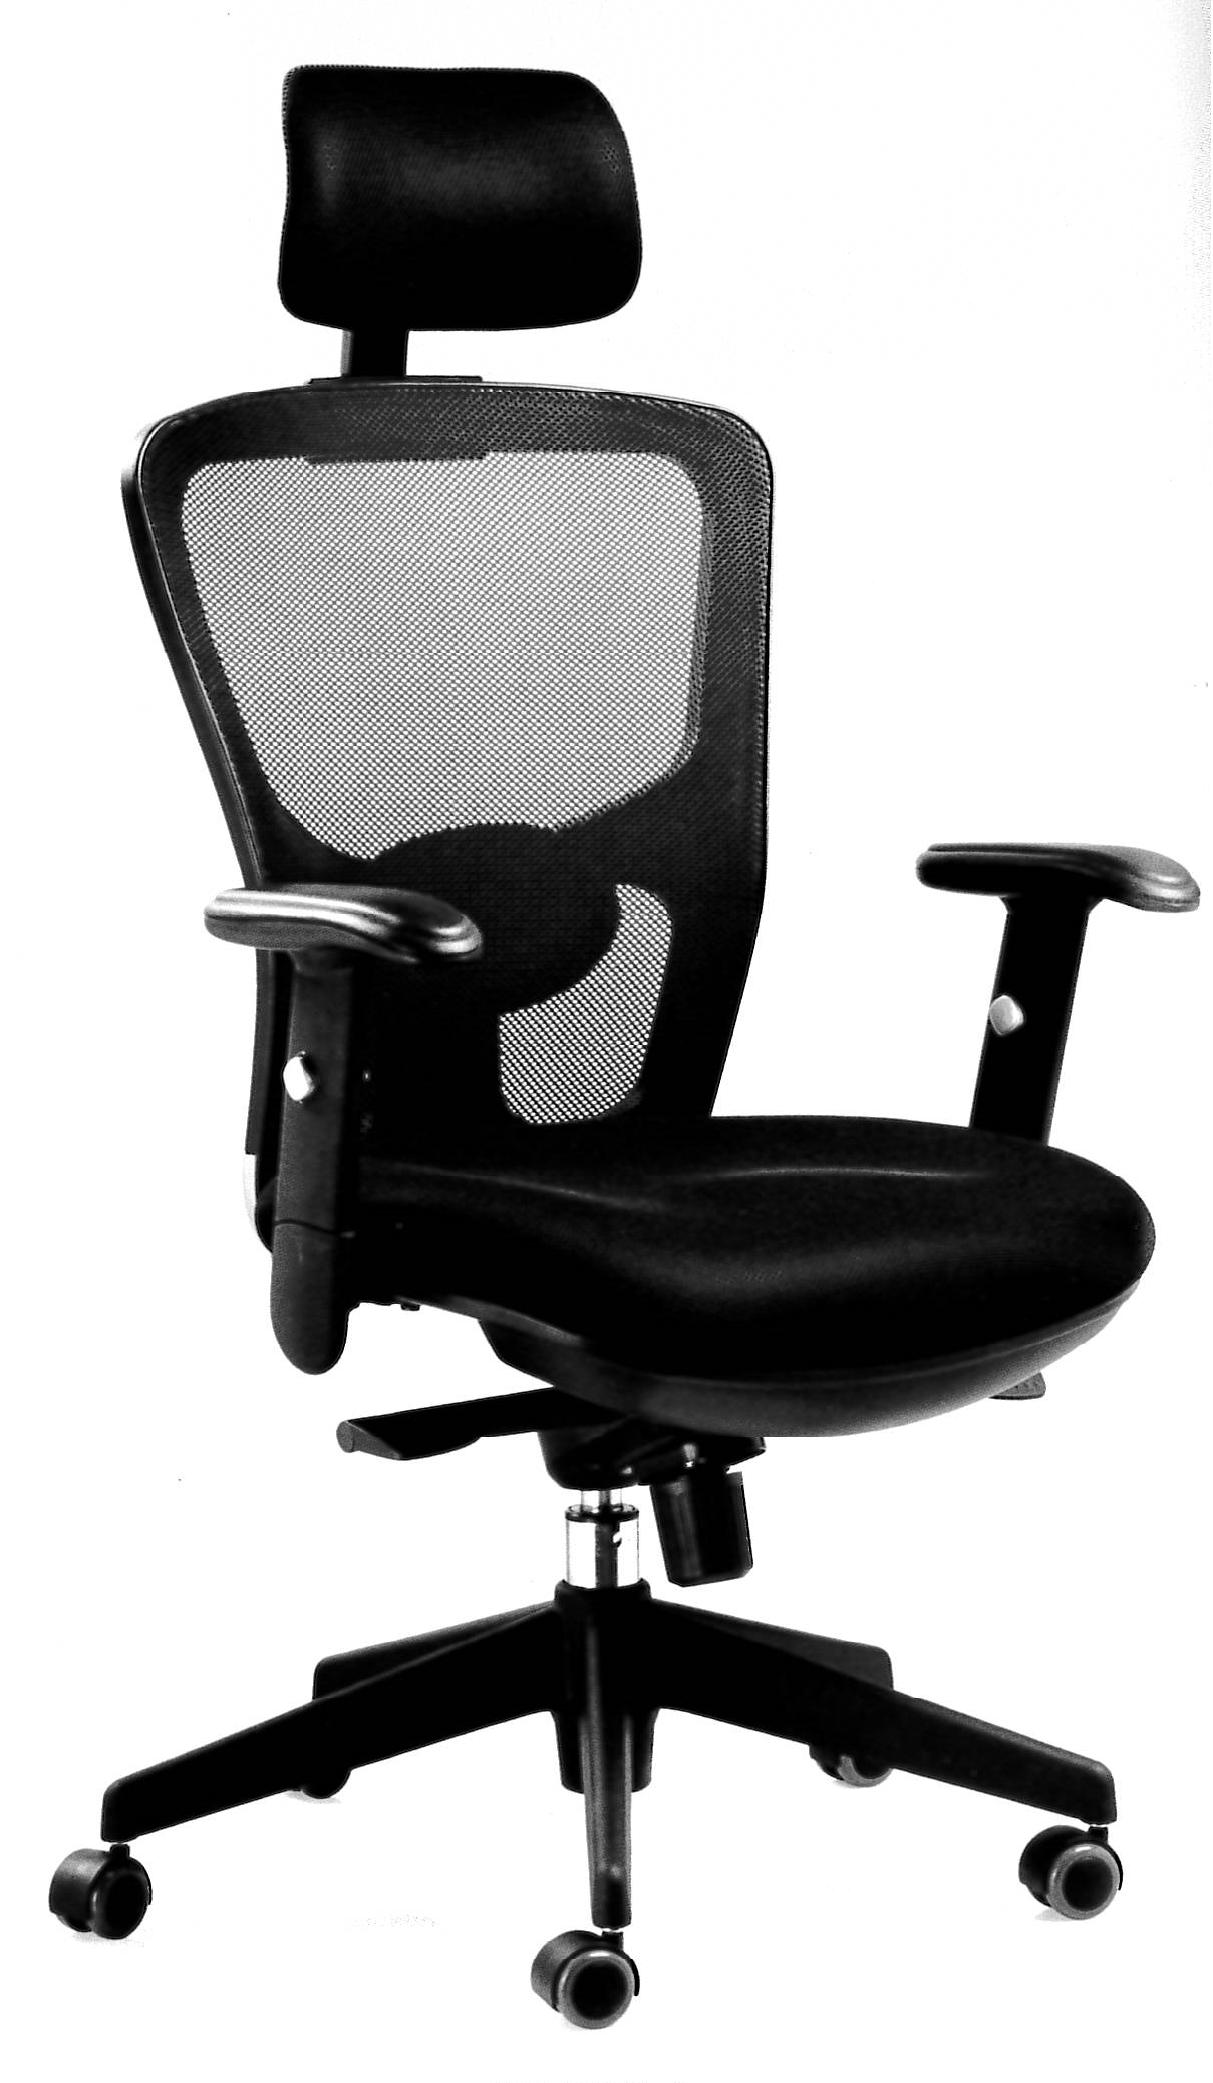 fauteuil de bureau lex offital. Black Bedroom Furniture Sets. Home Design Ideas